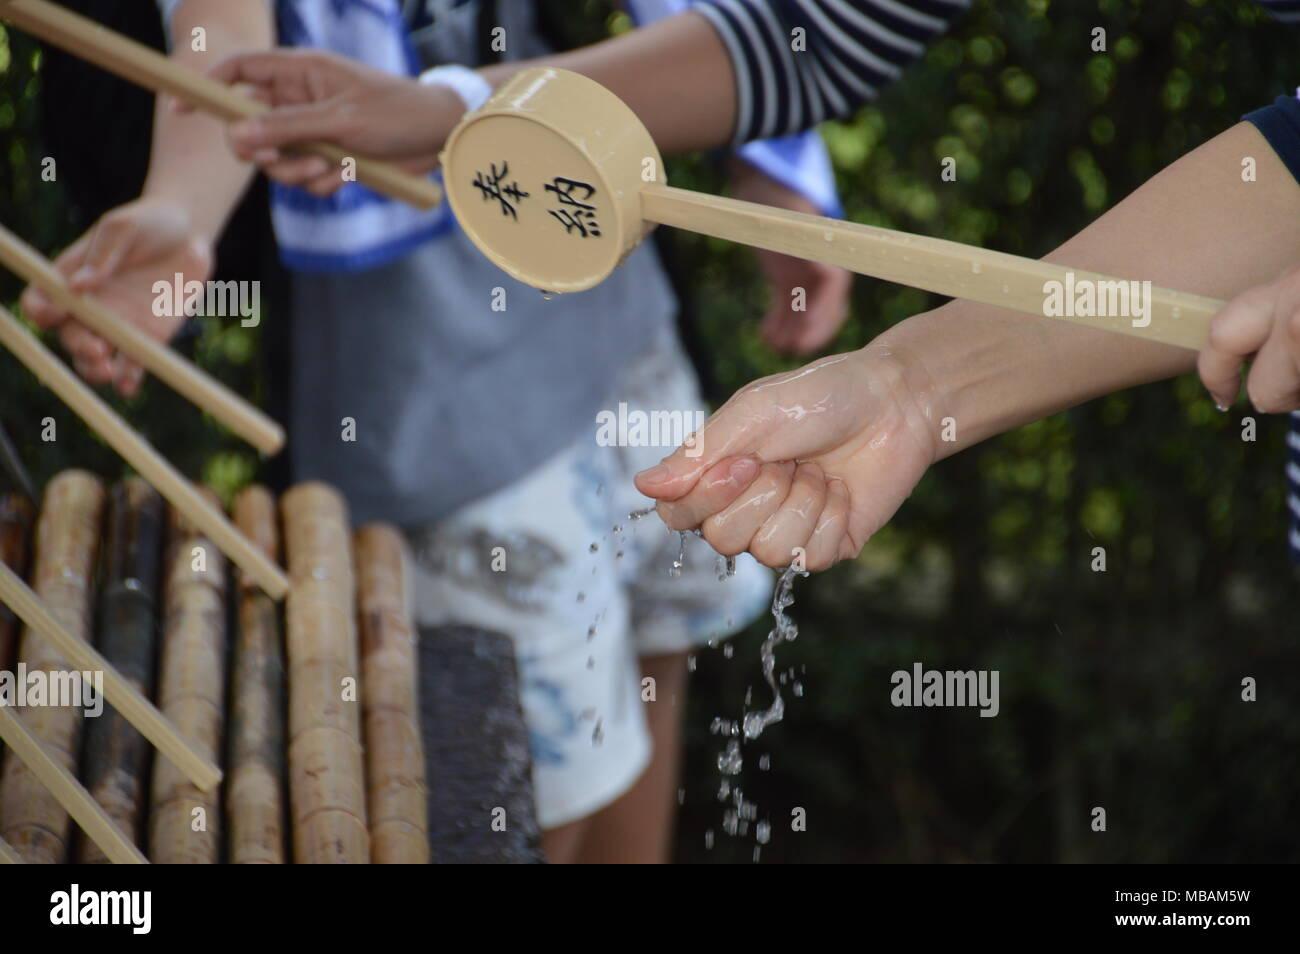 Washing Hands At A Japanese Shrine At Ise Japan - Stock Image